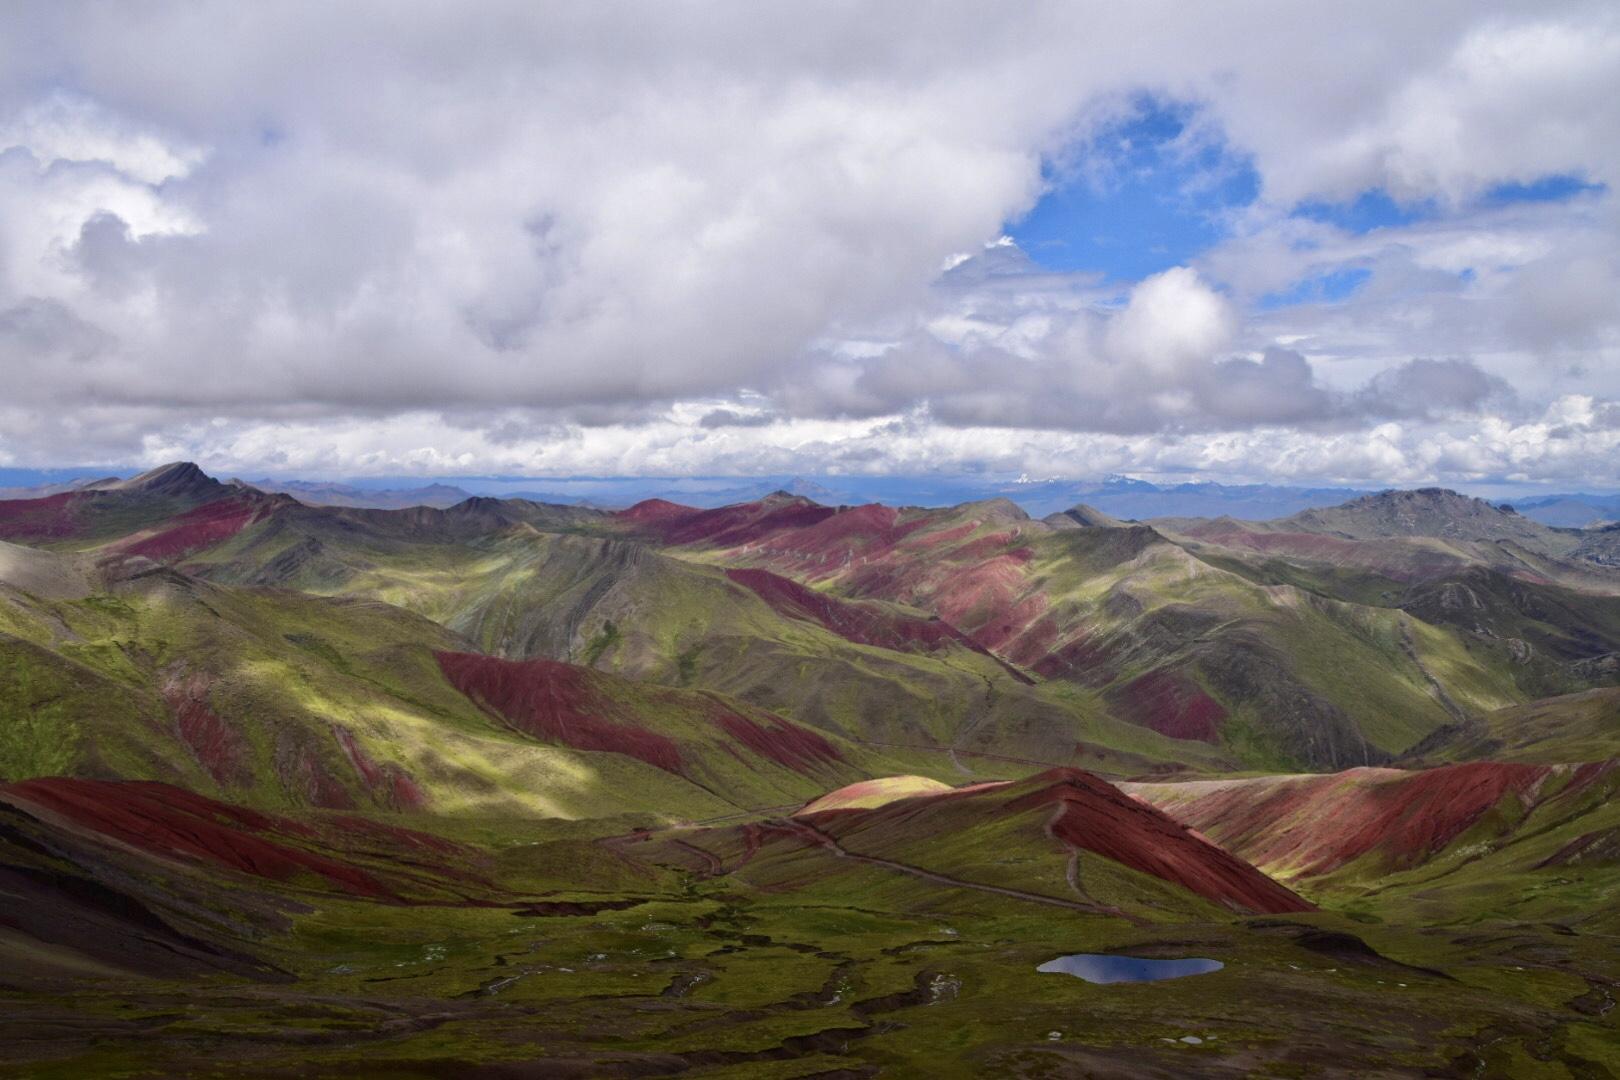 reisebericht-erlebnisreise-suedamerika-sara-rainbow-mountain-1